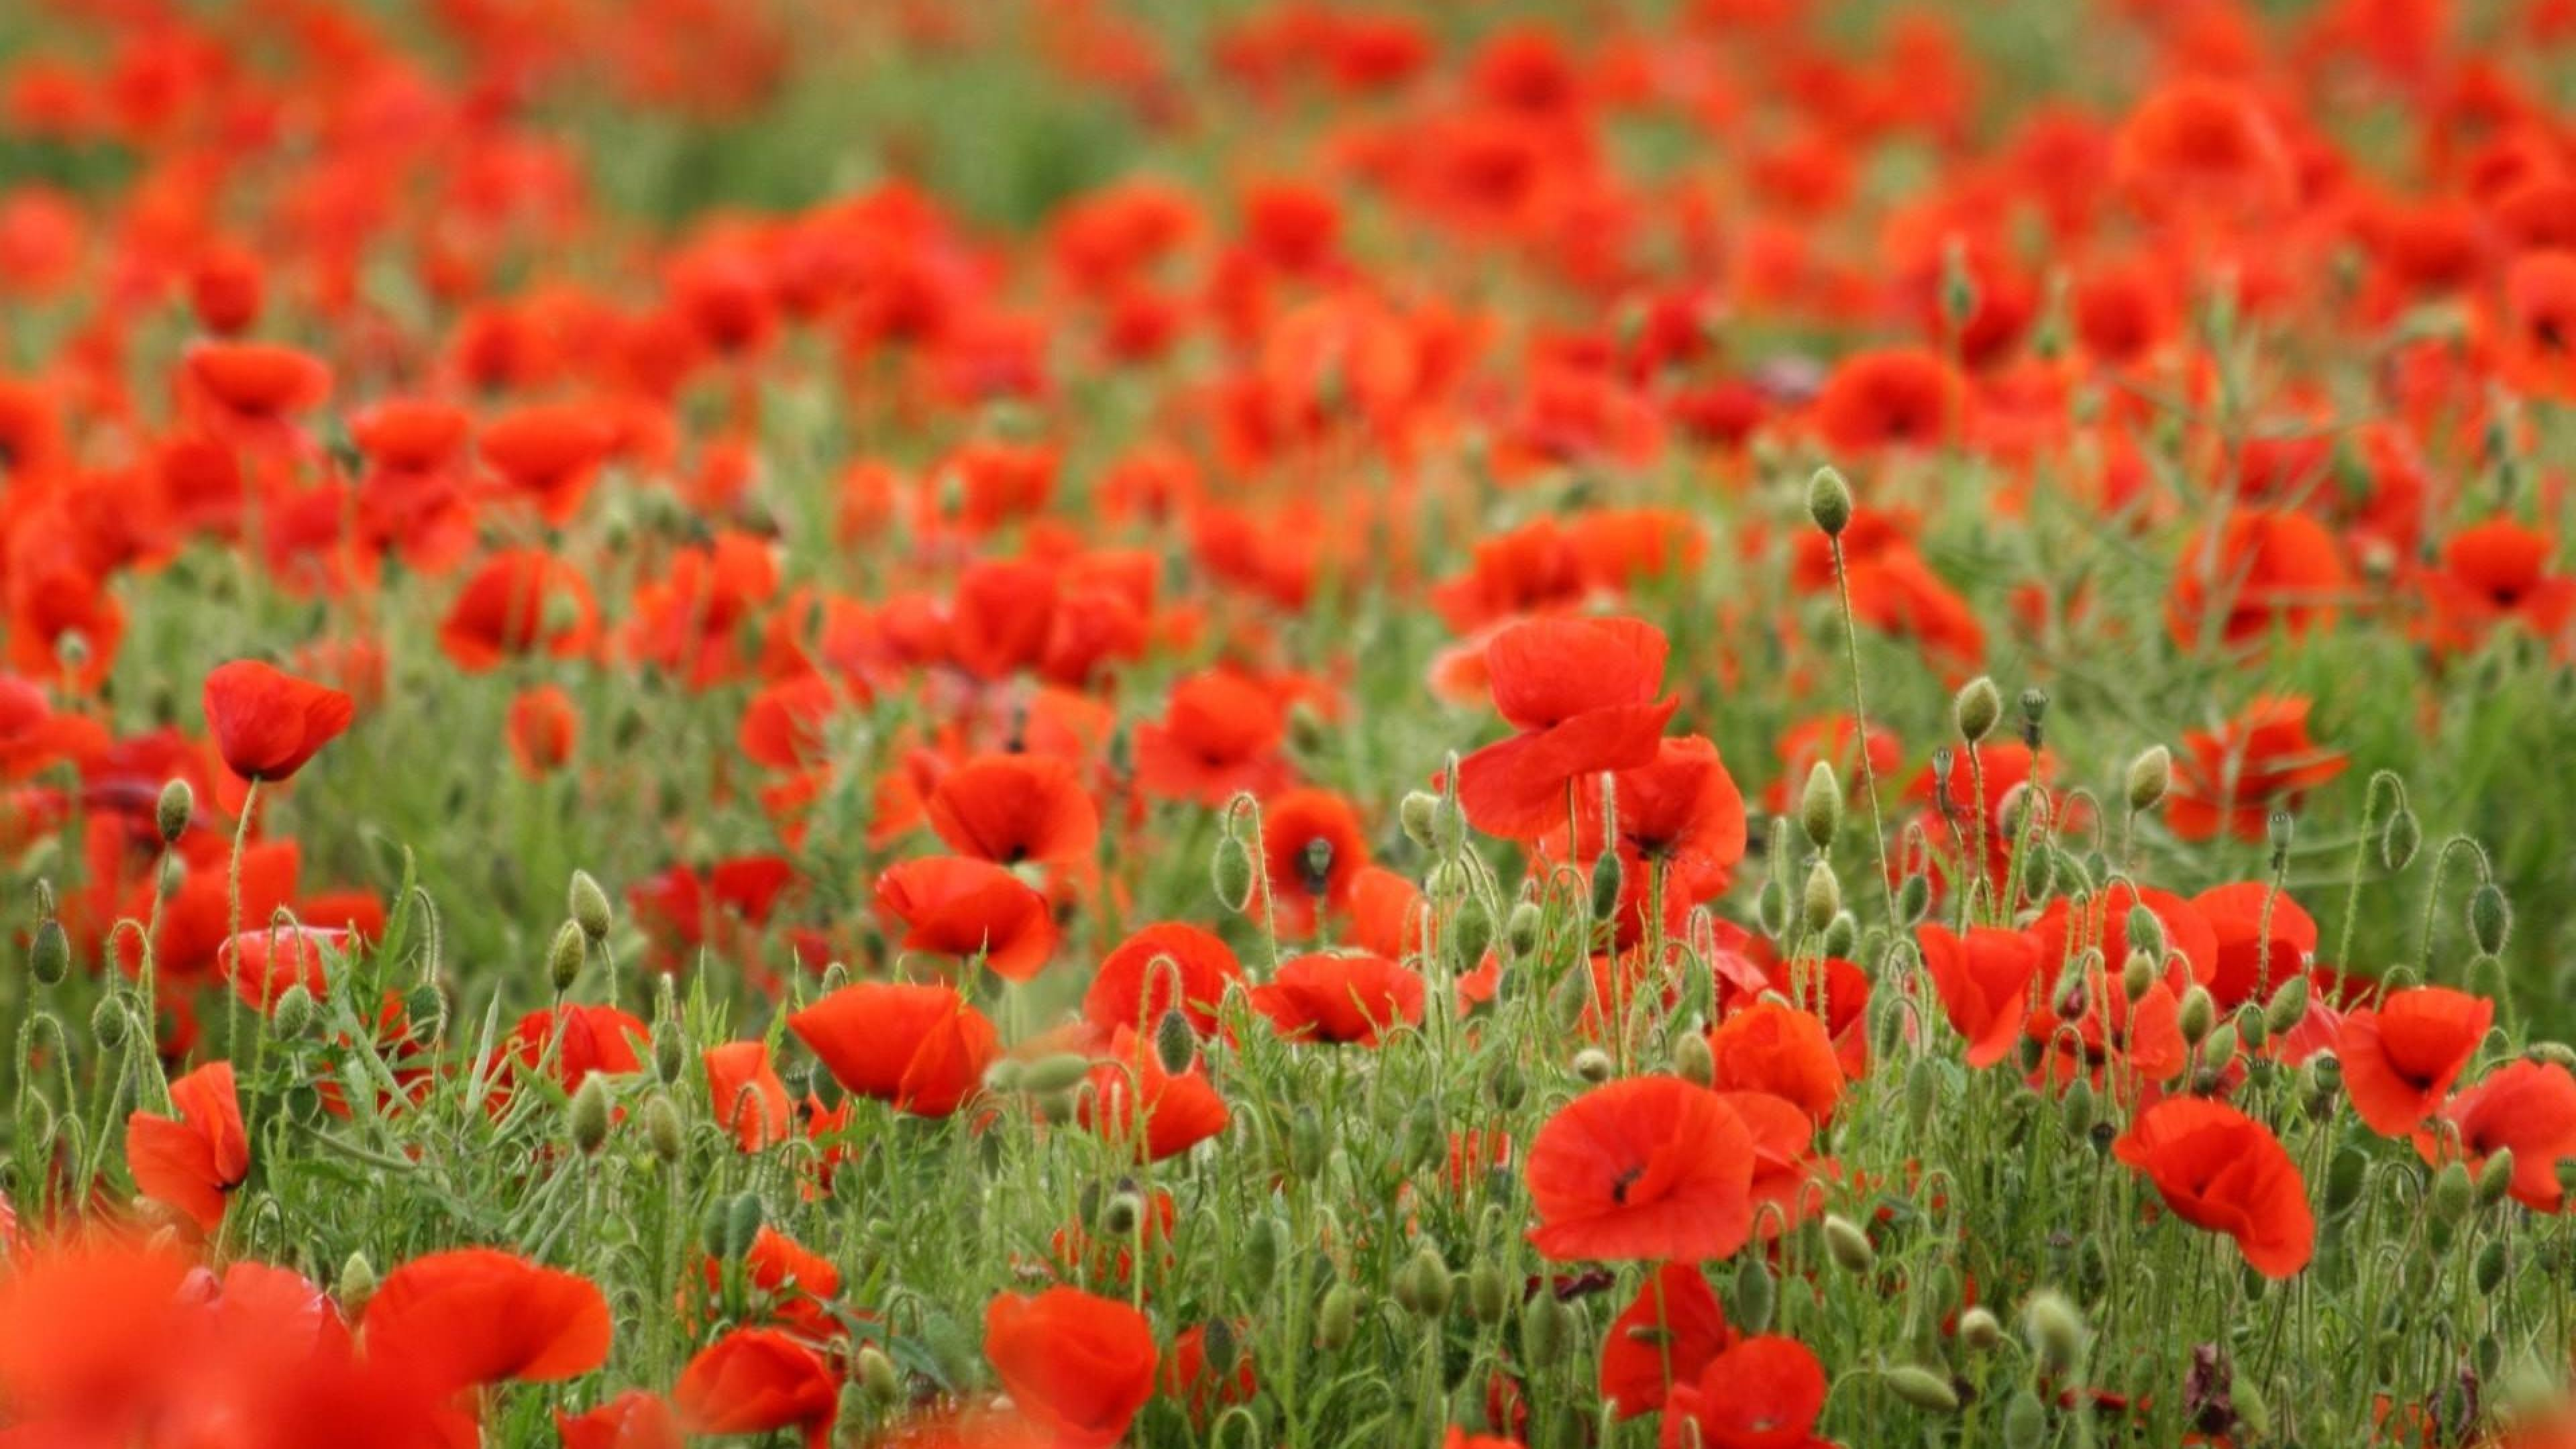 field-of-poppies-uhd-wallpaper-10